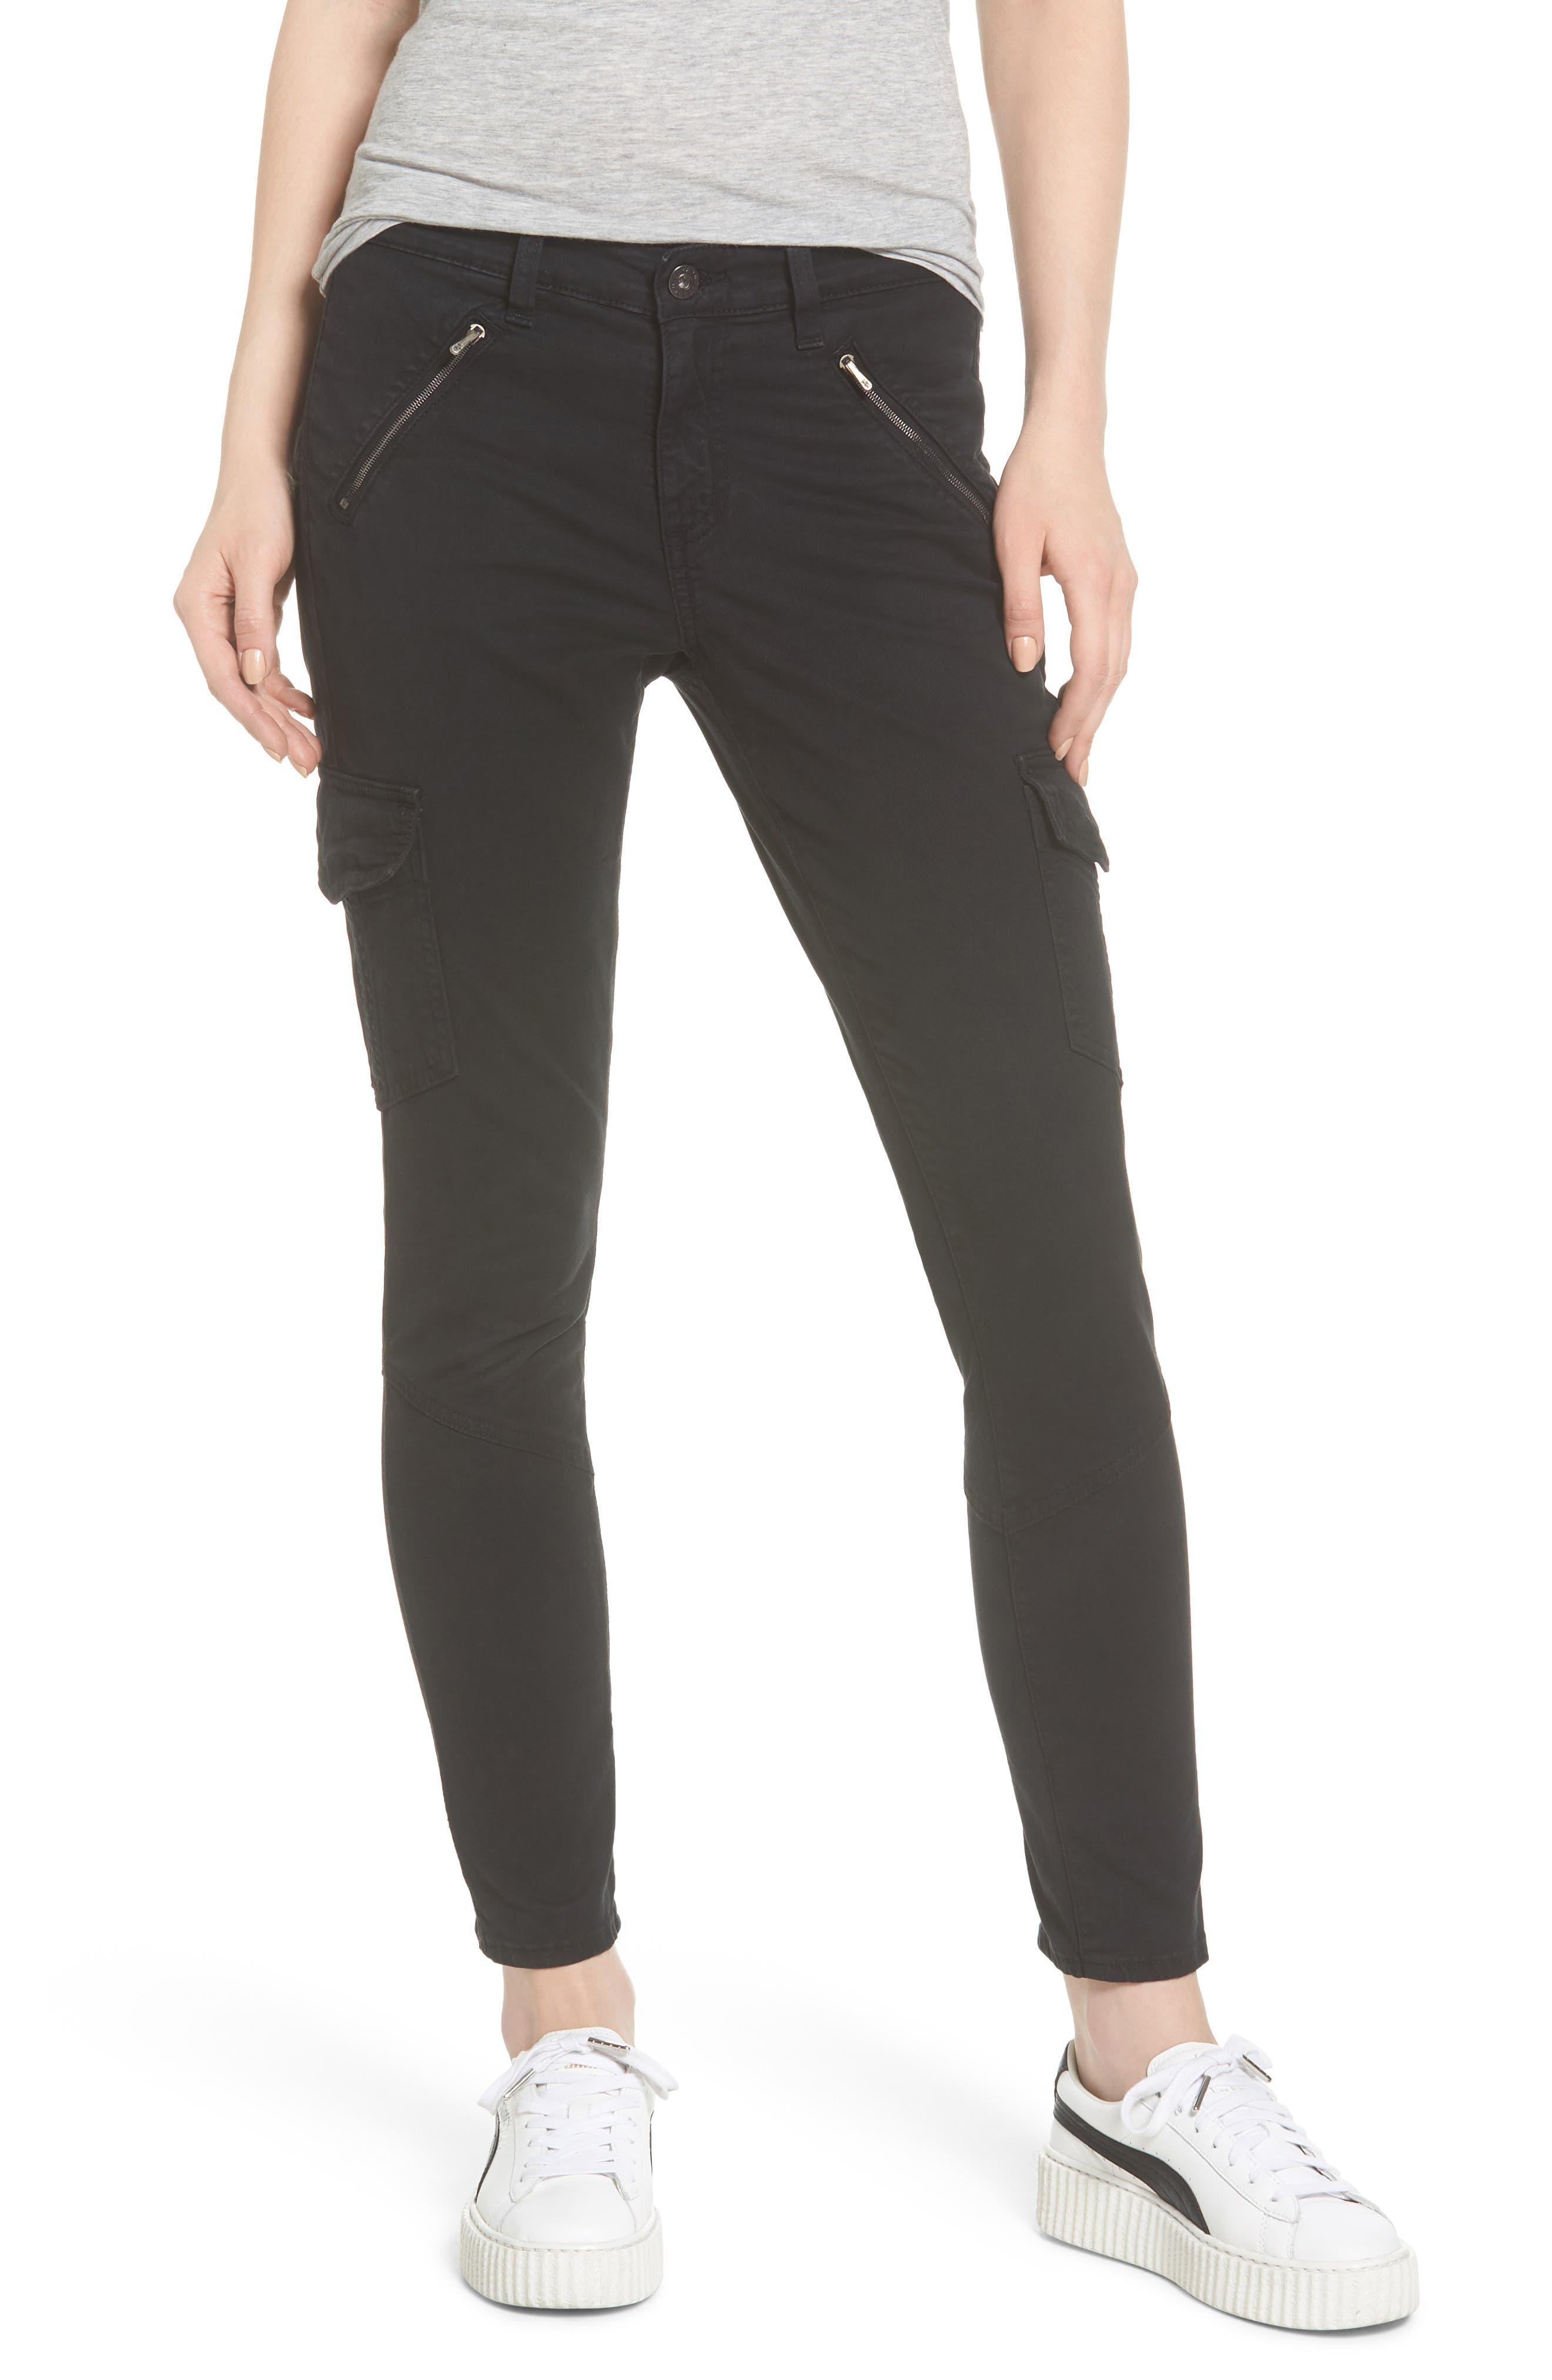 Whitt Ankle Skinny Cargo Pants,                         Main,                         color, Sulfur Black